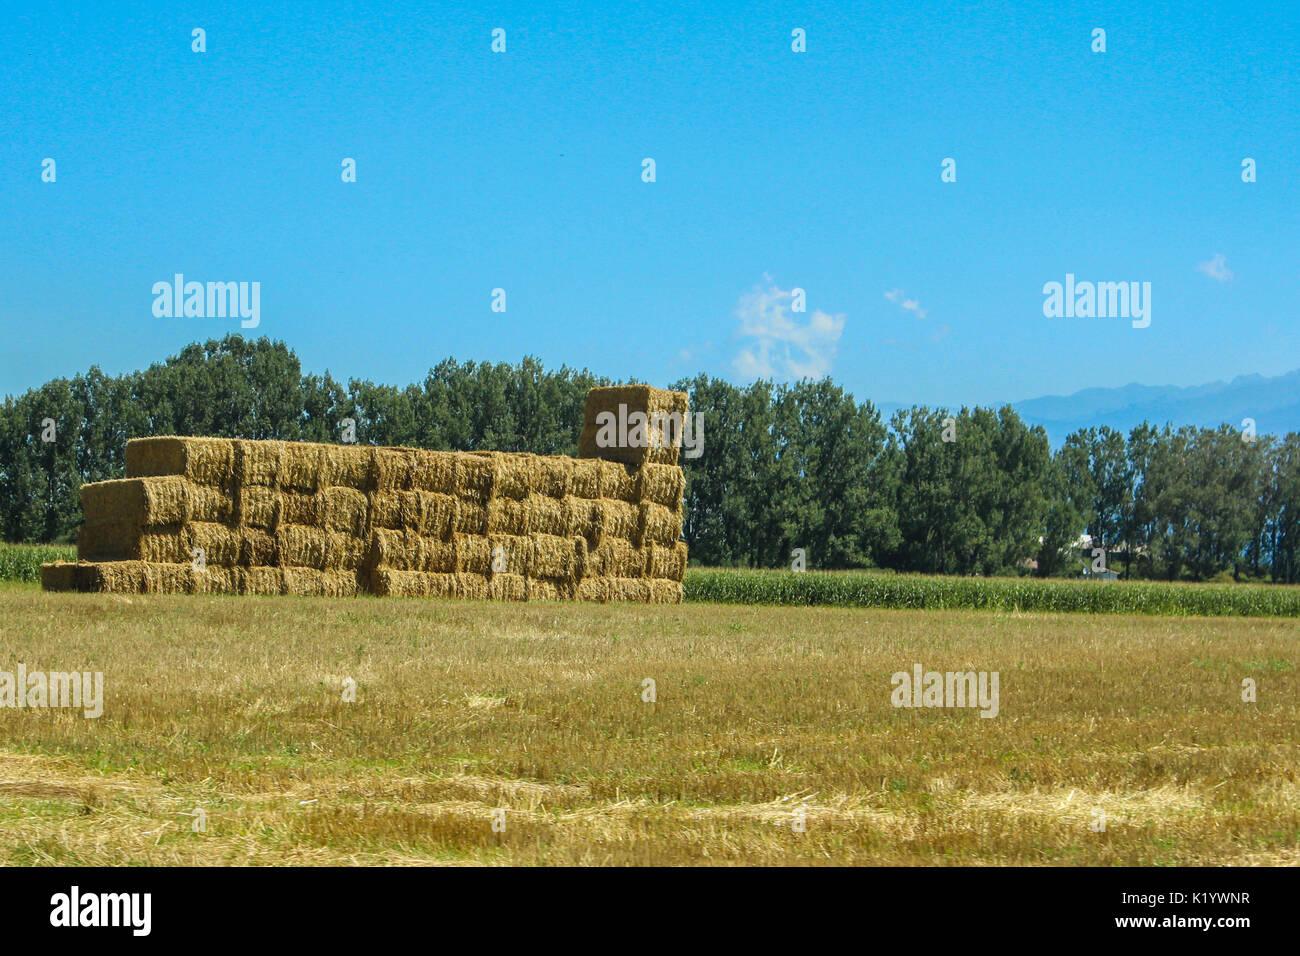 Rectangular pille of starws in the field Stock Photo